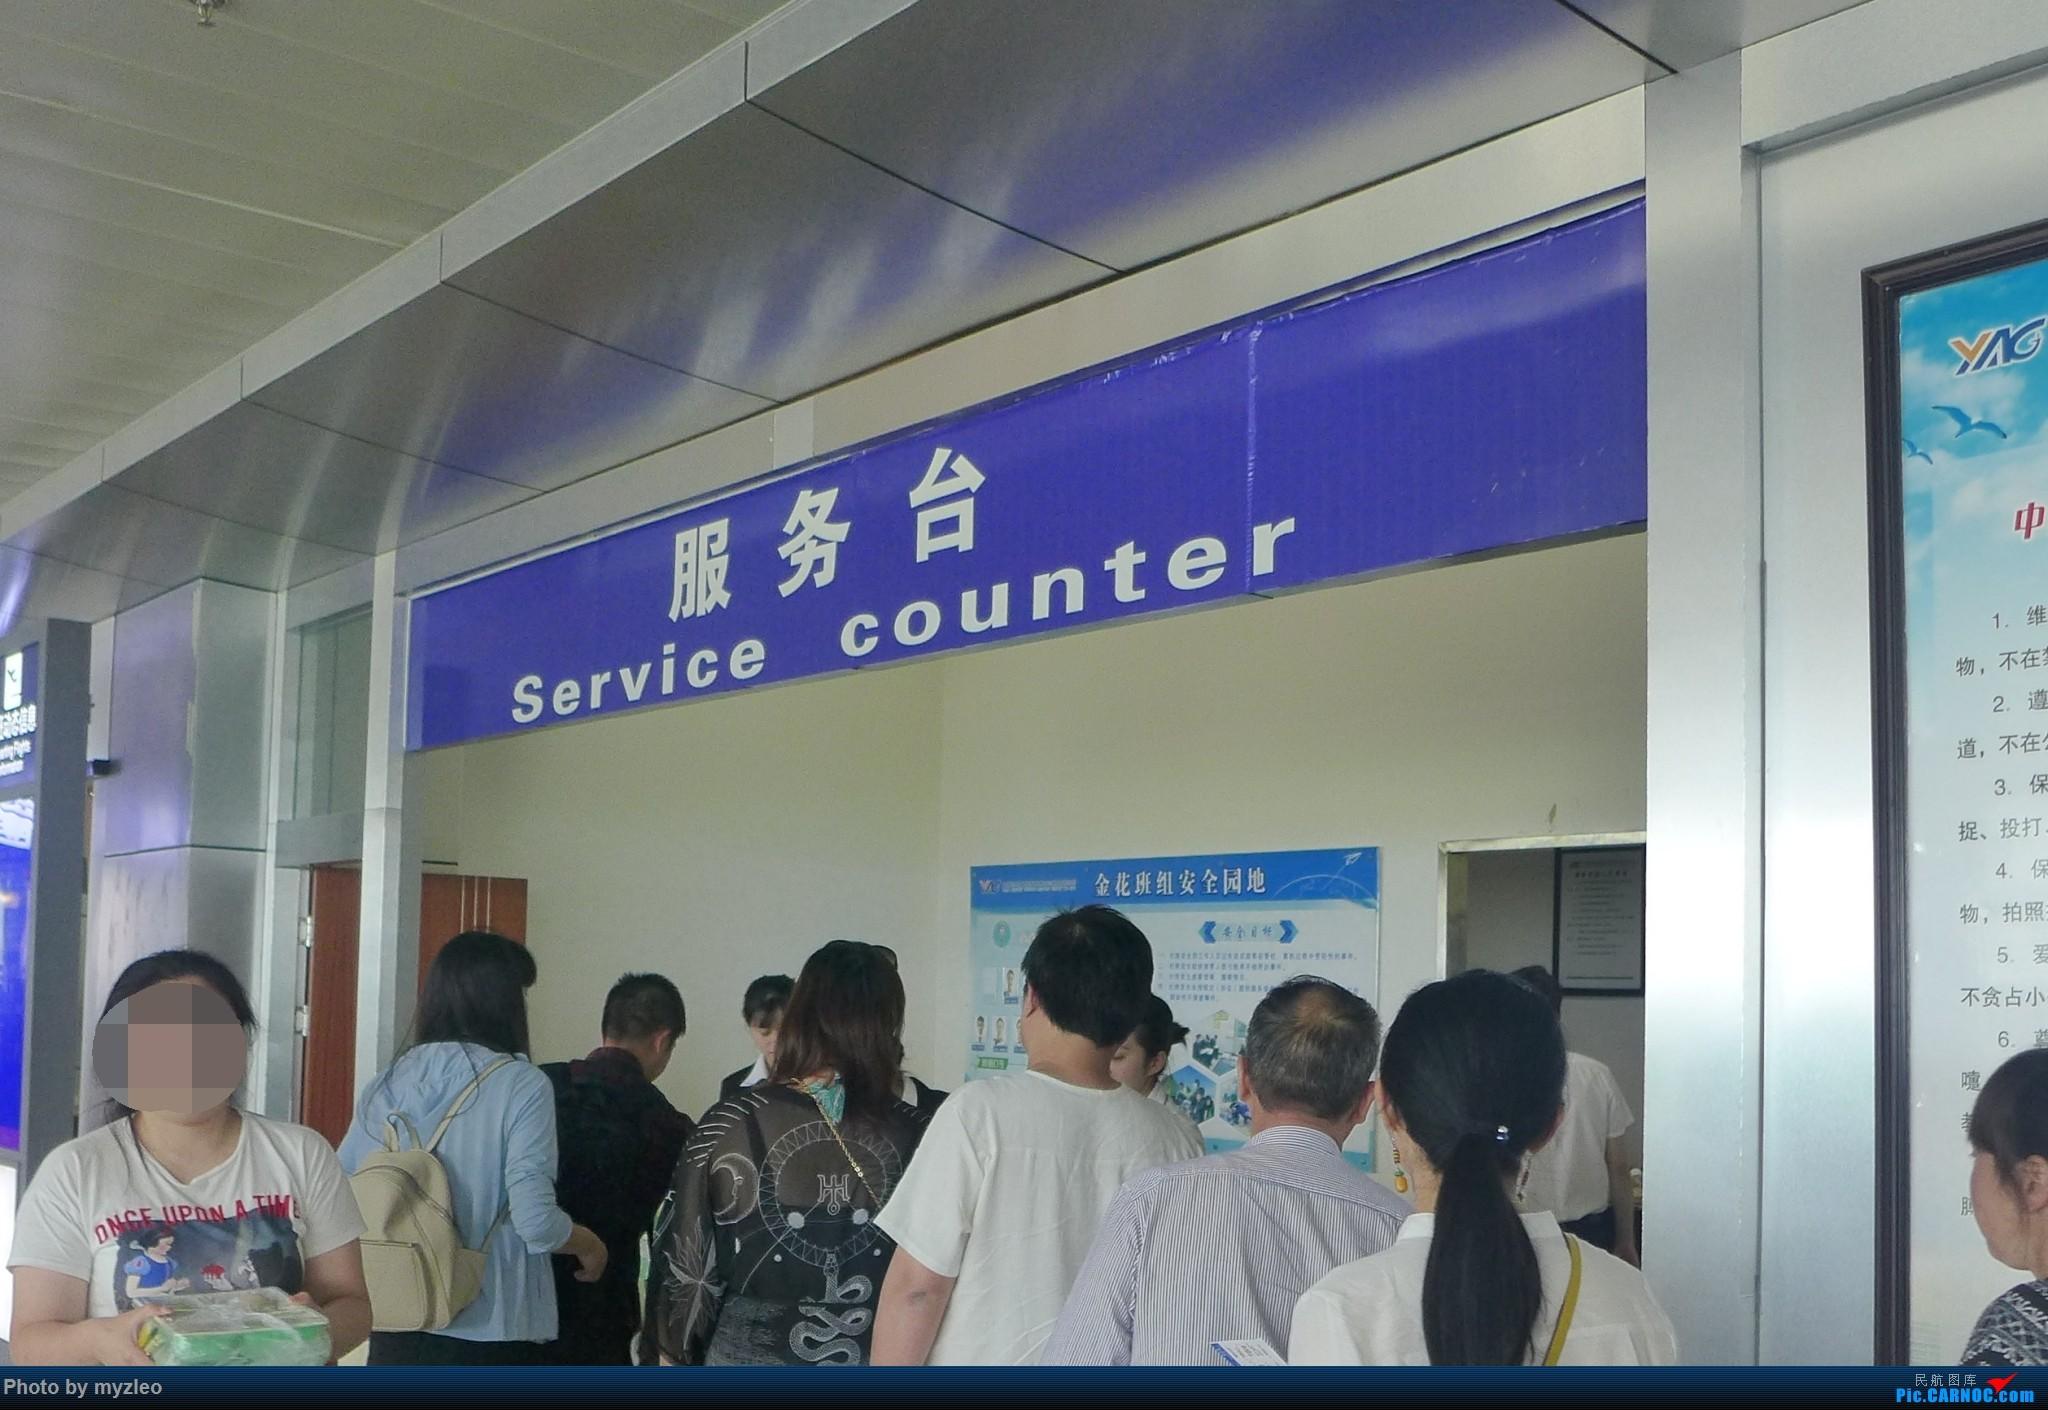 Re:[原创]【myzleo的游记2.2】昆洱风光(2)——去大理+人在大理+不舍返沪 BOEING 737-700 B-5821 中国大理机场 中国大理机场